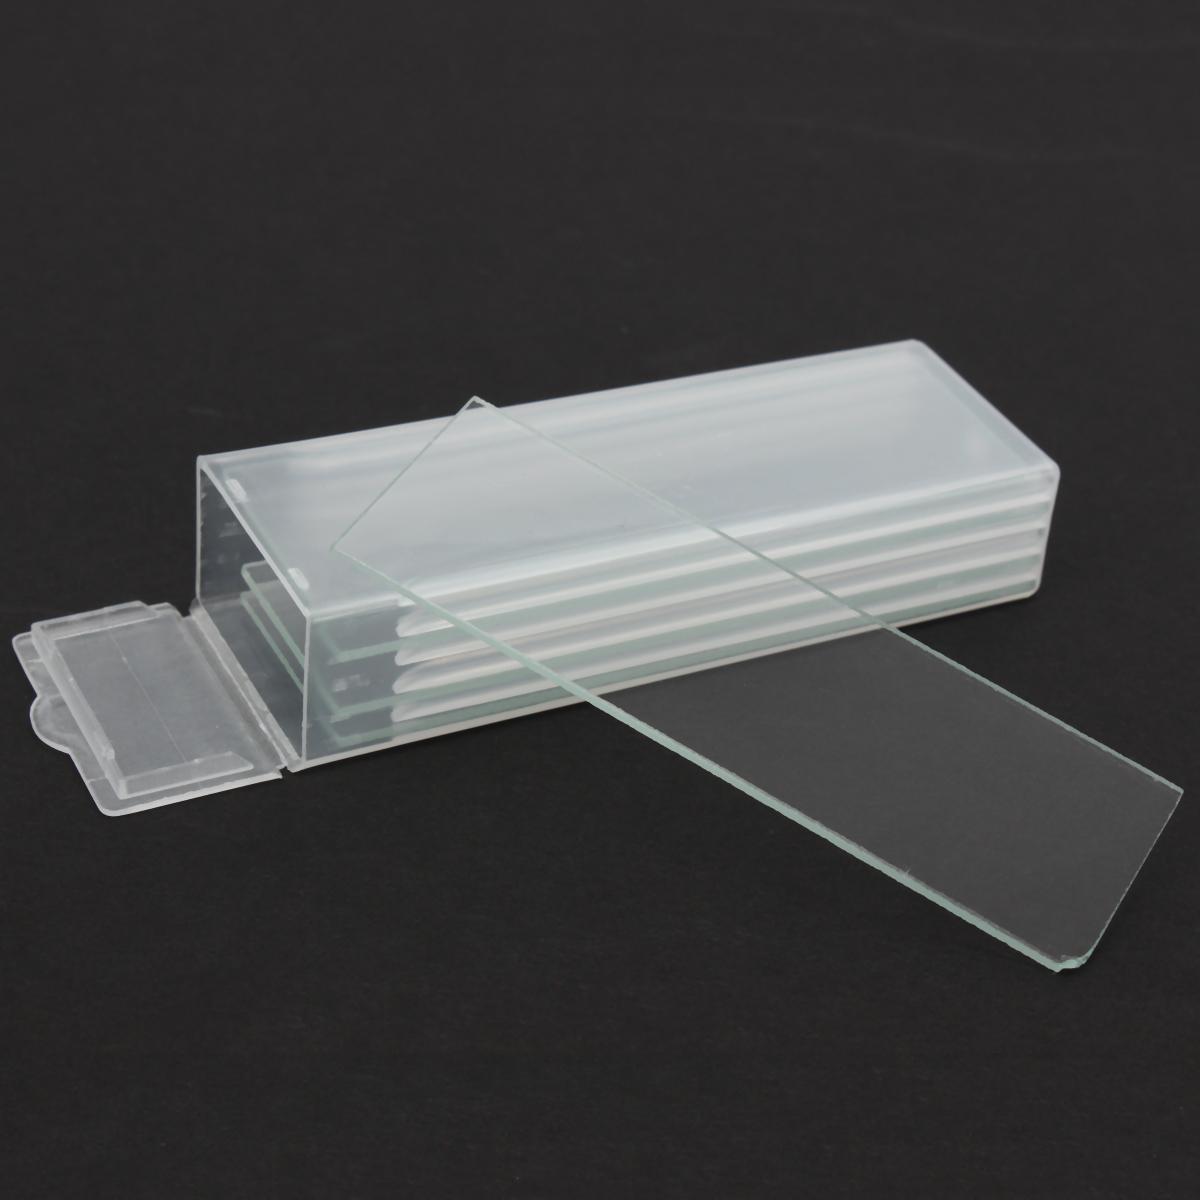 5pcs Single Concave Microscope Glass Slides Reusable Laboratory Blank 1mm